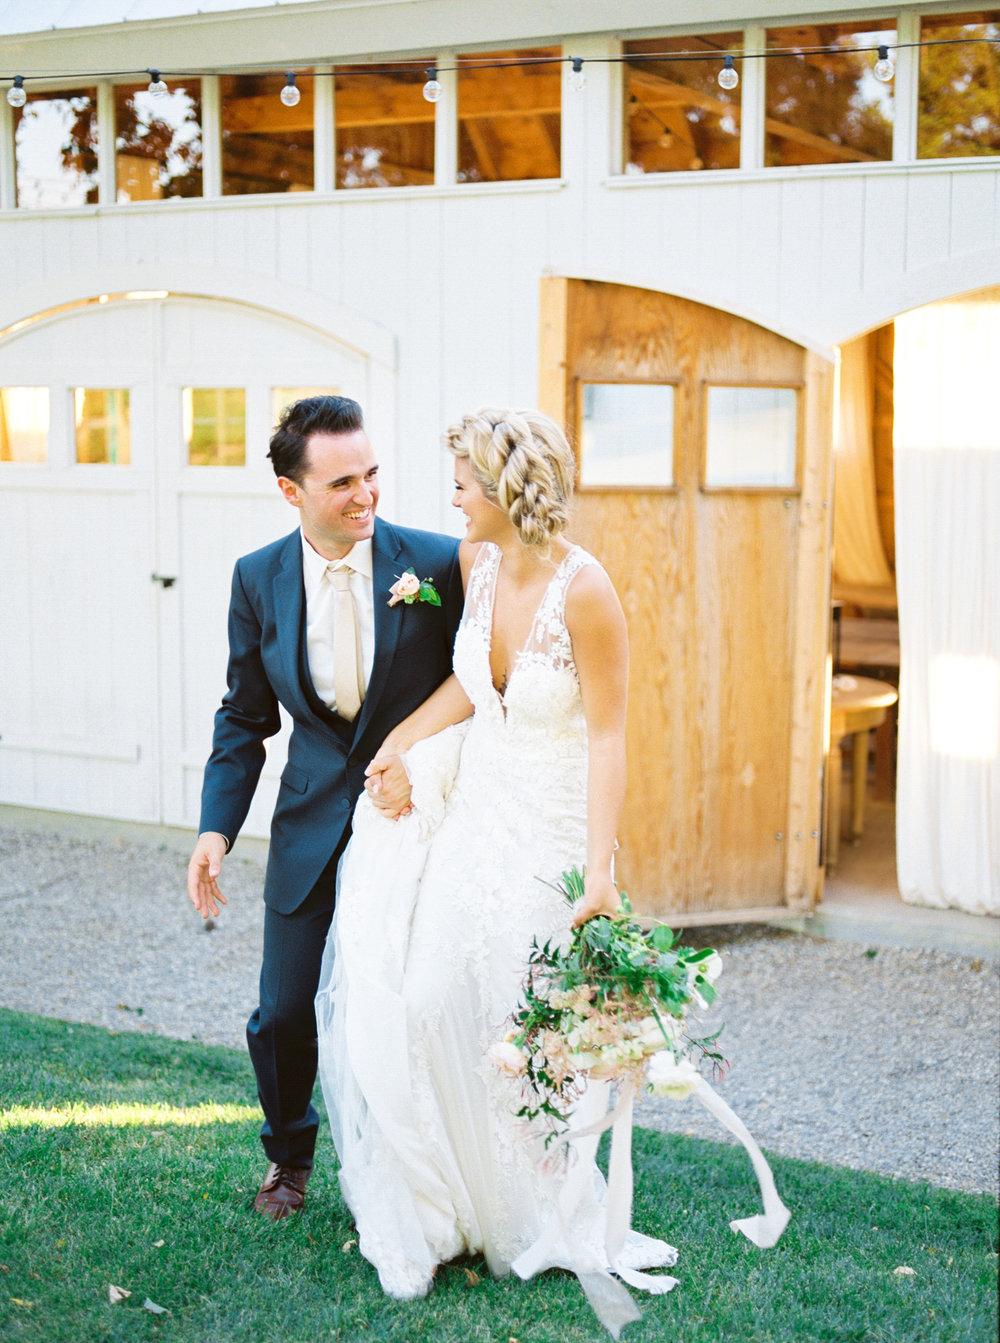 Southern-California-Wedding-Natalie-Schutt-Photography_10.jpg